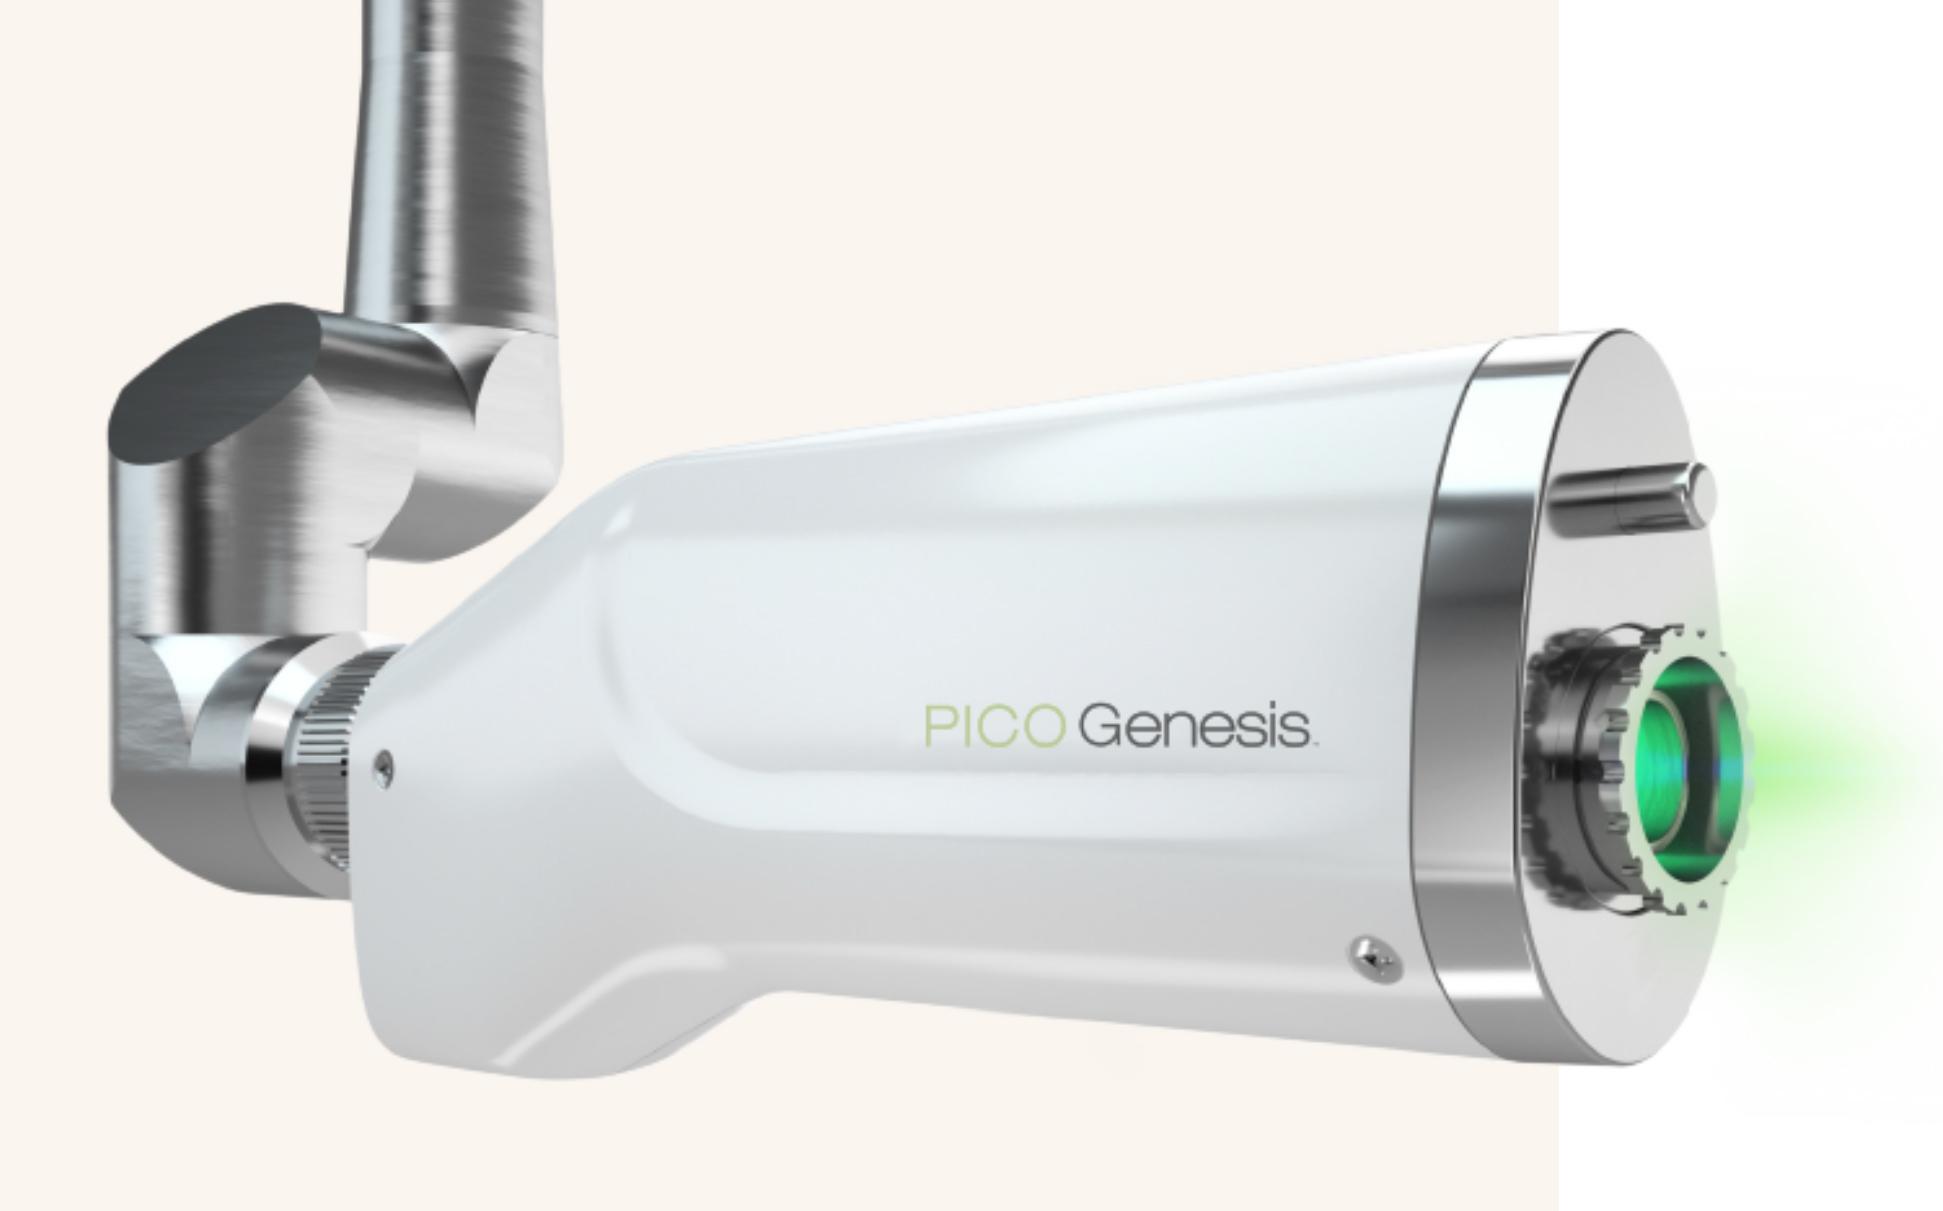 picogenesis handpiece